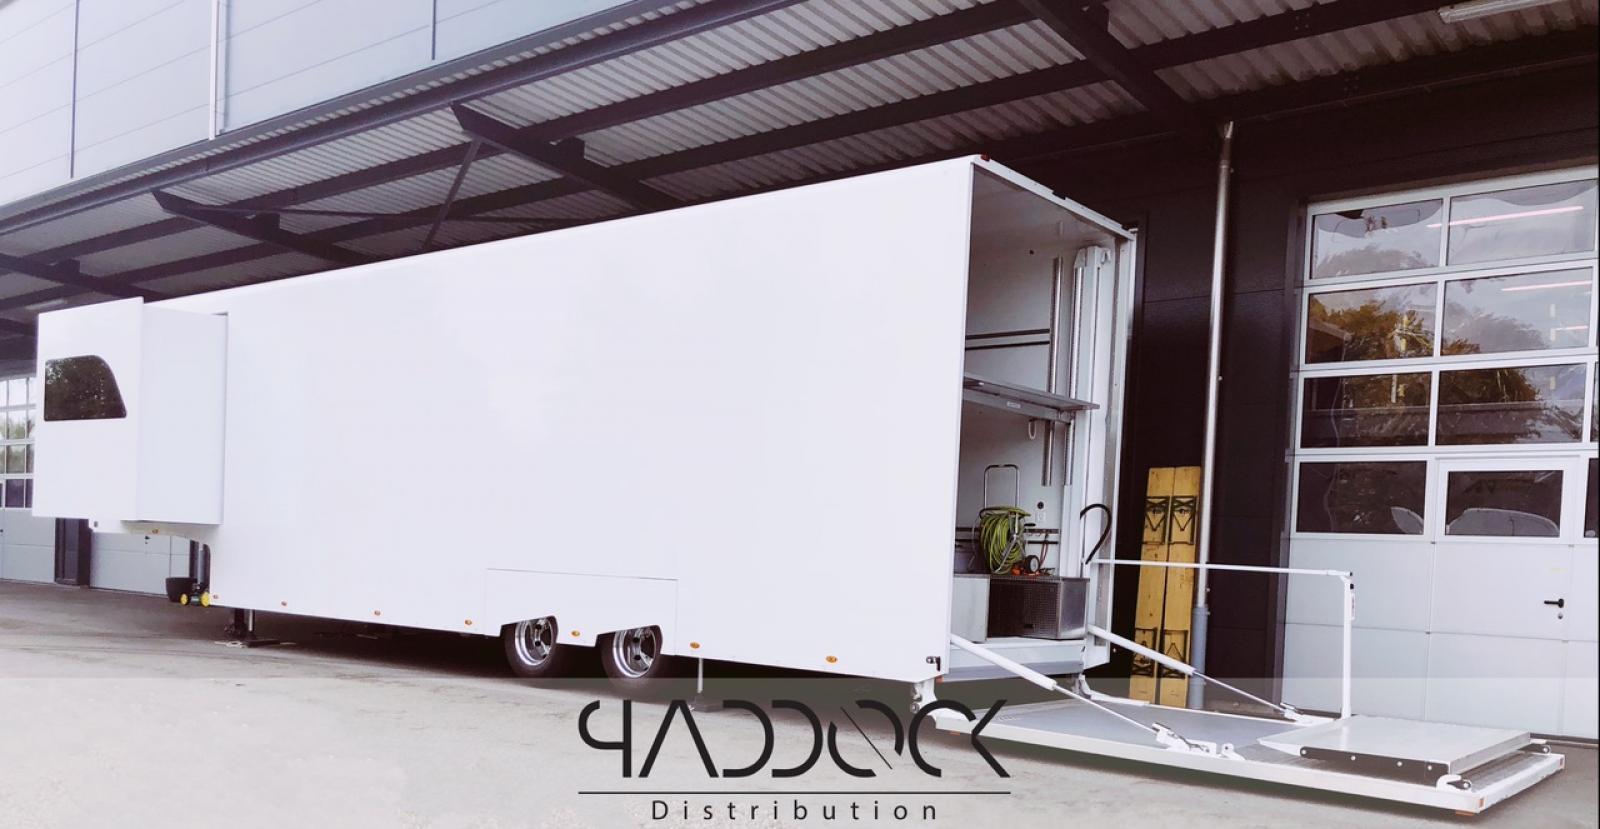 Z3 SLIDE ASTA CAR BY PADDOCK DISTRIBUTION - 2